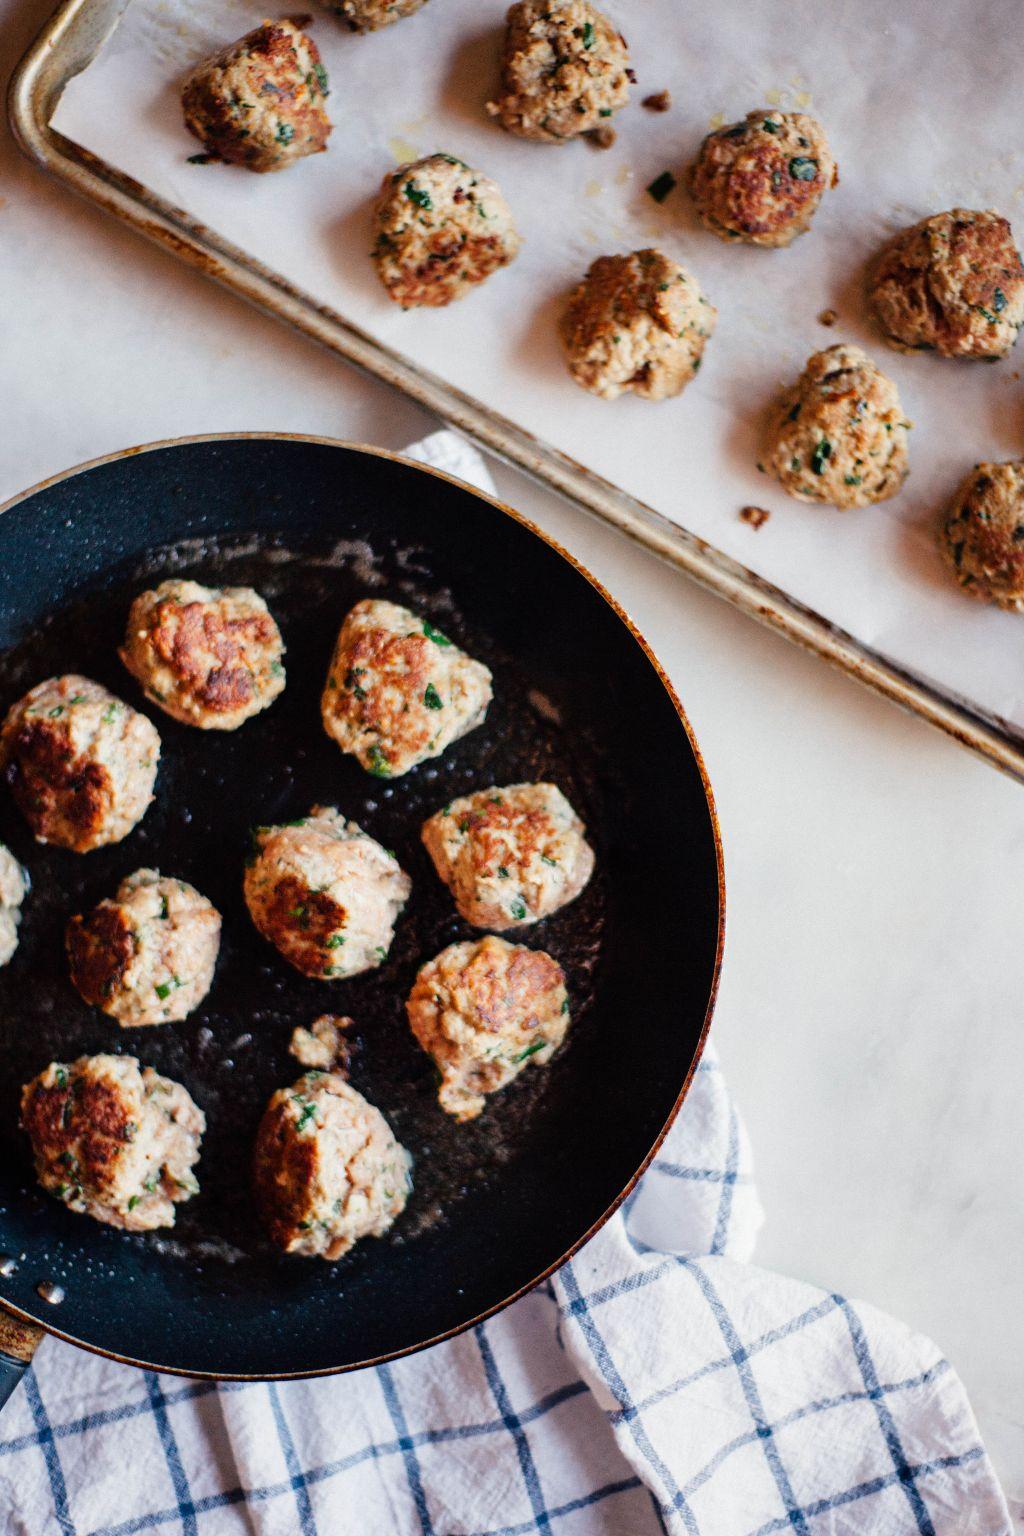 Game Night Turkey Meatballs - Tastemaker Blog